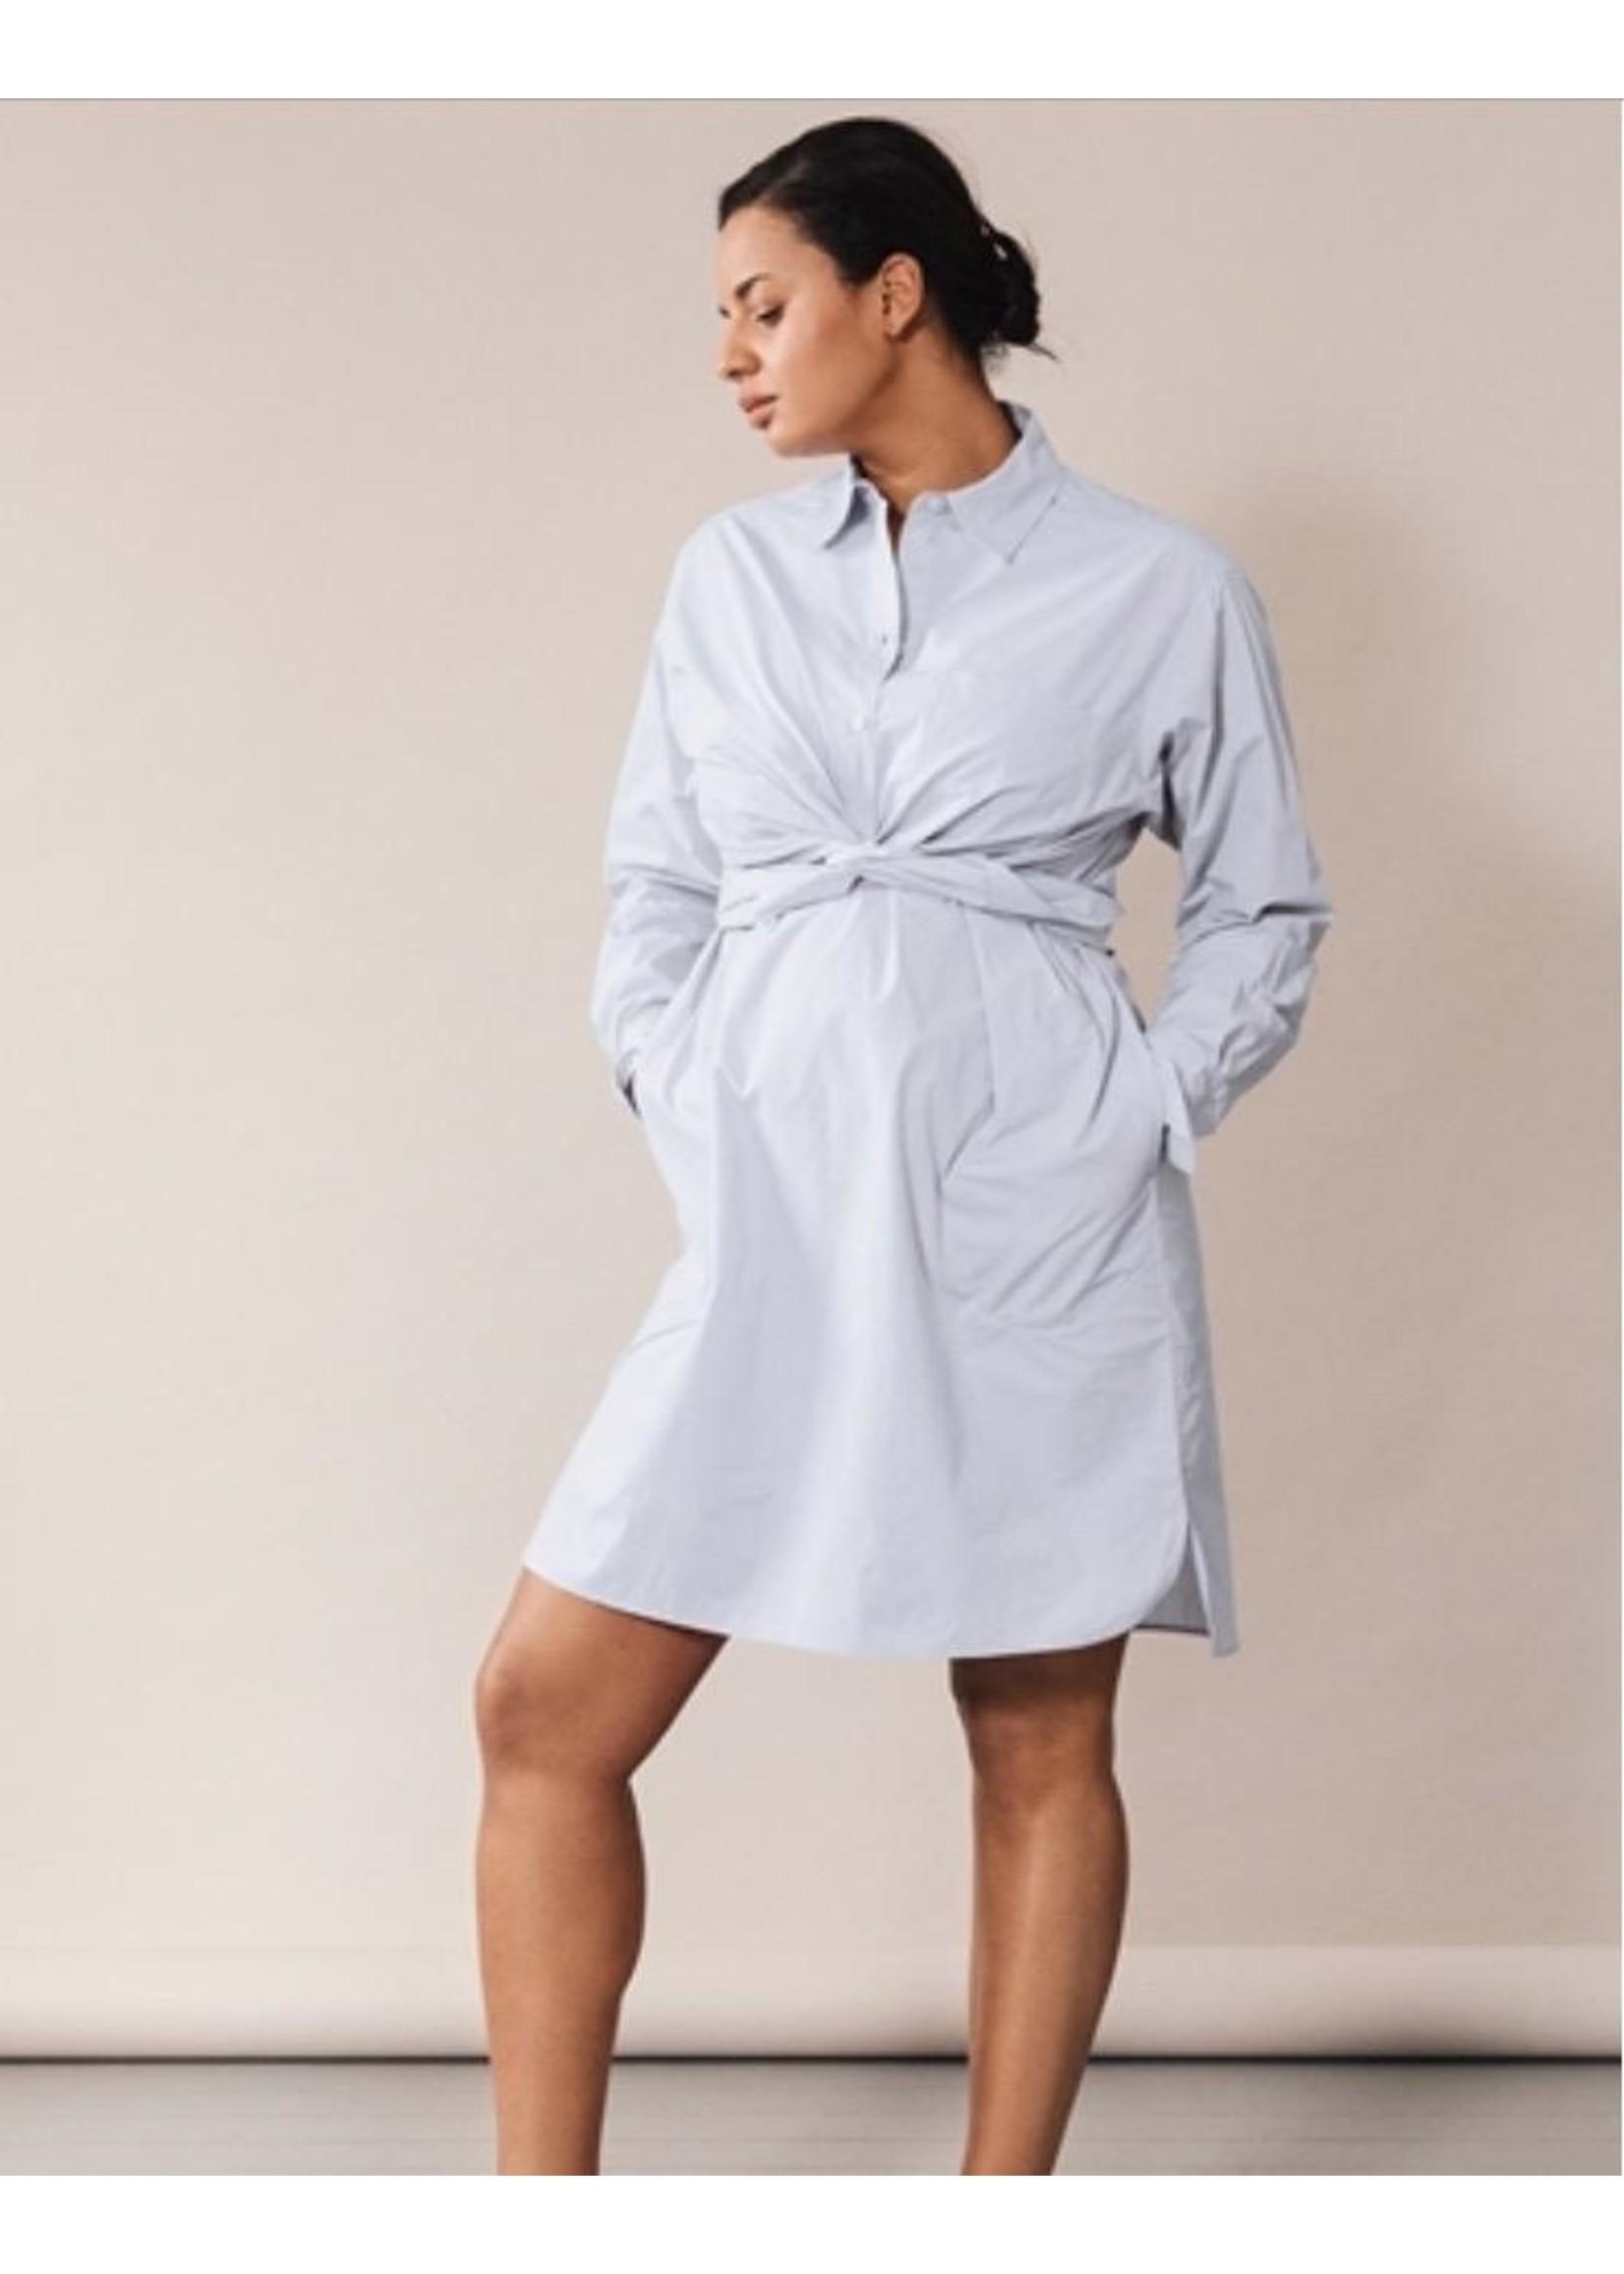 Boob Design Boob Design, The Duo Shirtdress in Sky Blue